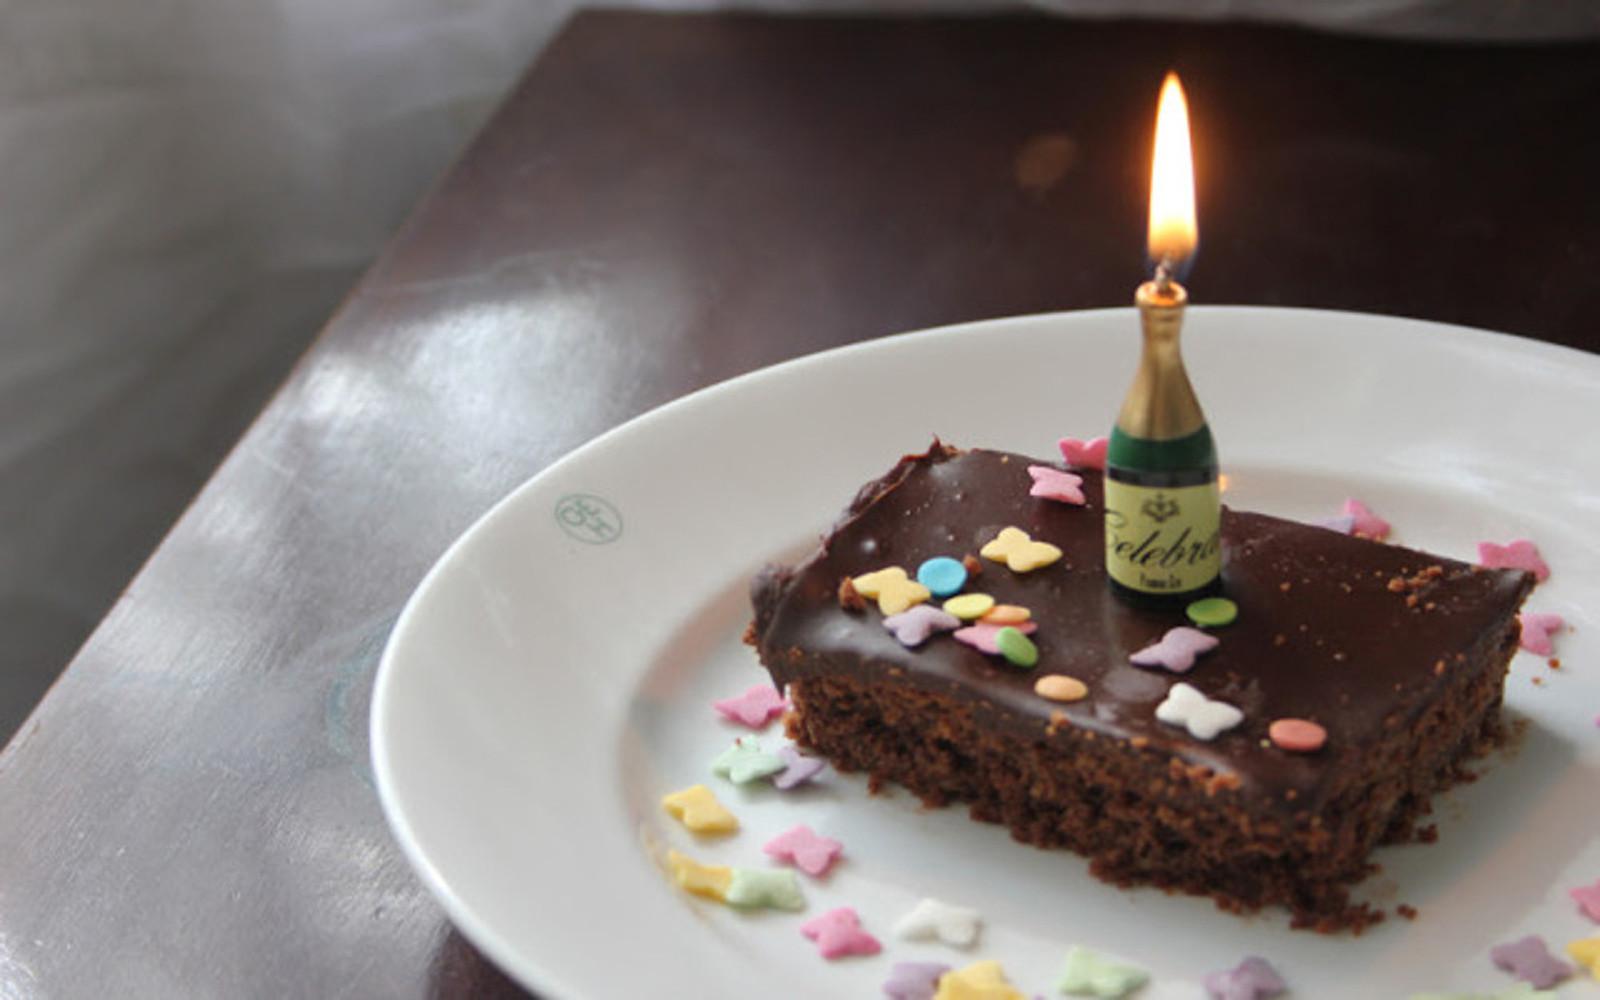 Vegan Birthday Cake Delivery  10 Exquisite Vegan Birthday Cakes e Green Planet e